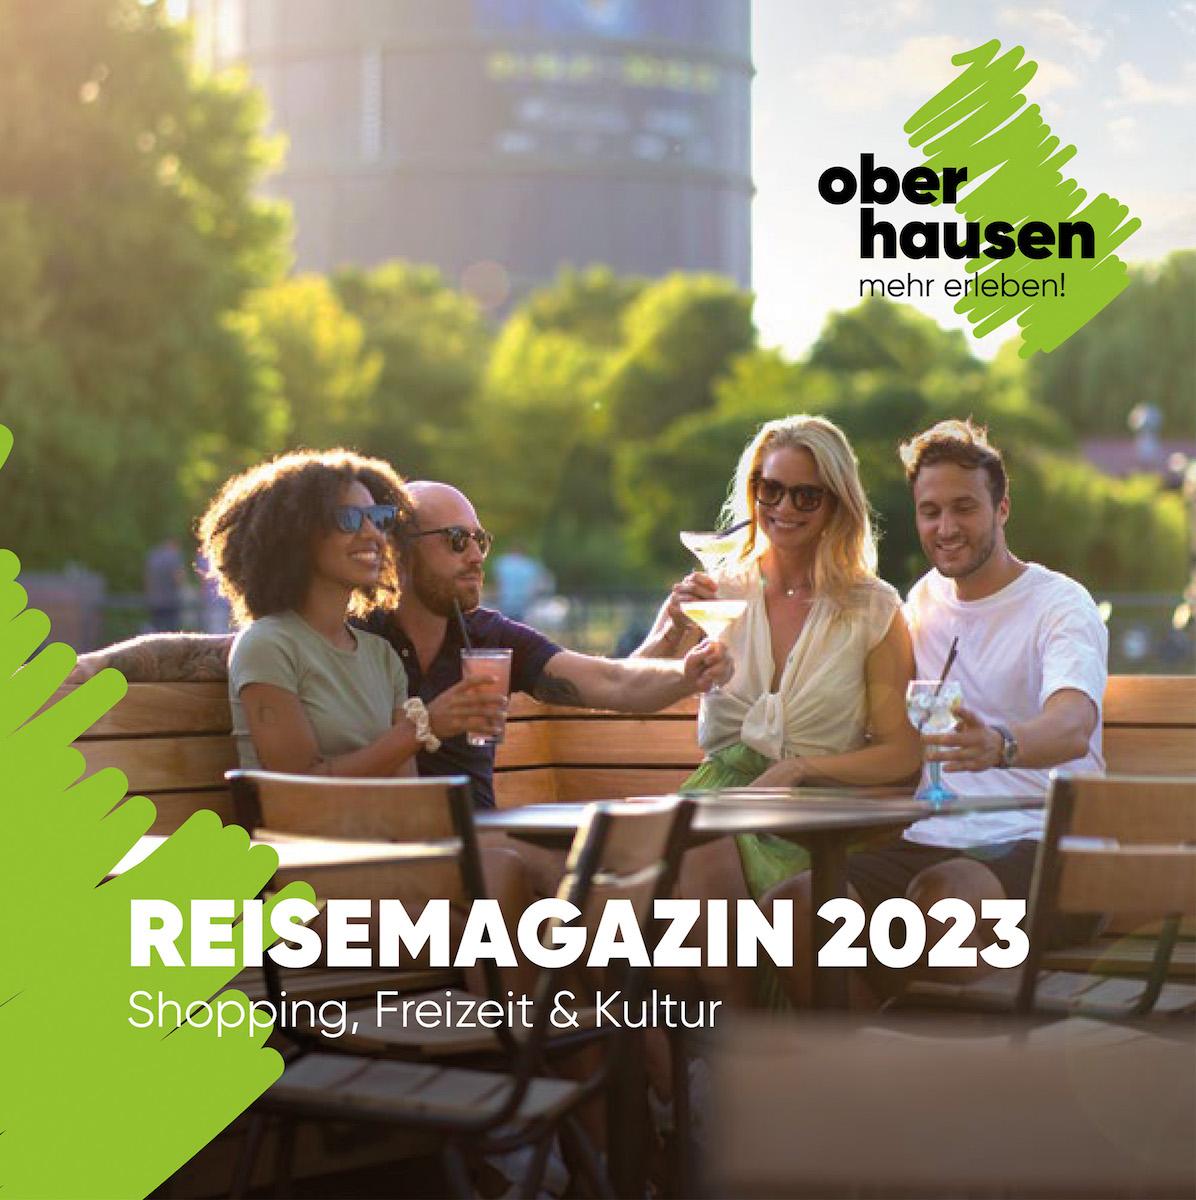 Ruhrgebiet - Oberhausen - Reisemagazin 2018 (pdf)